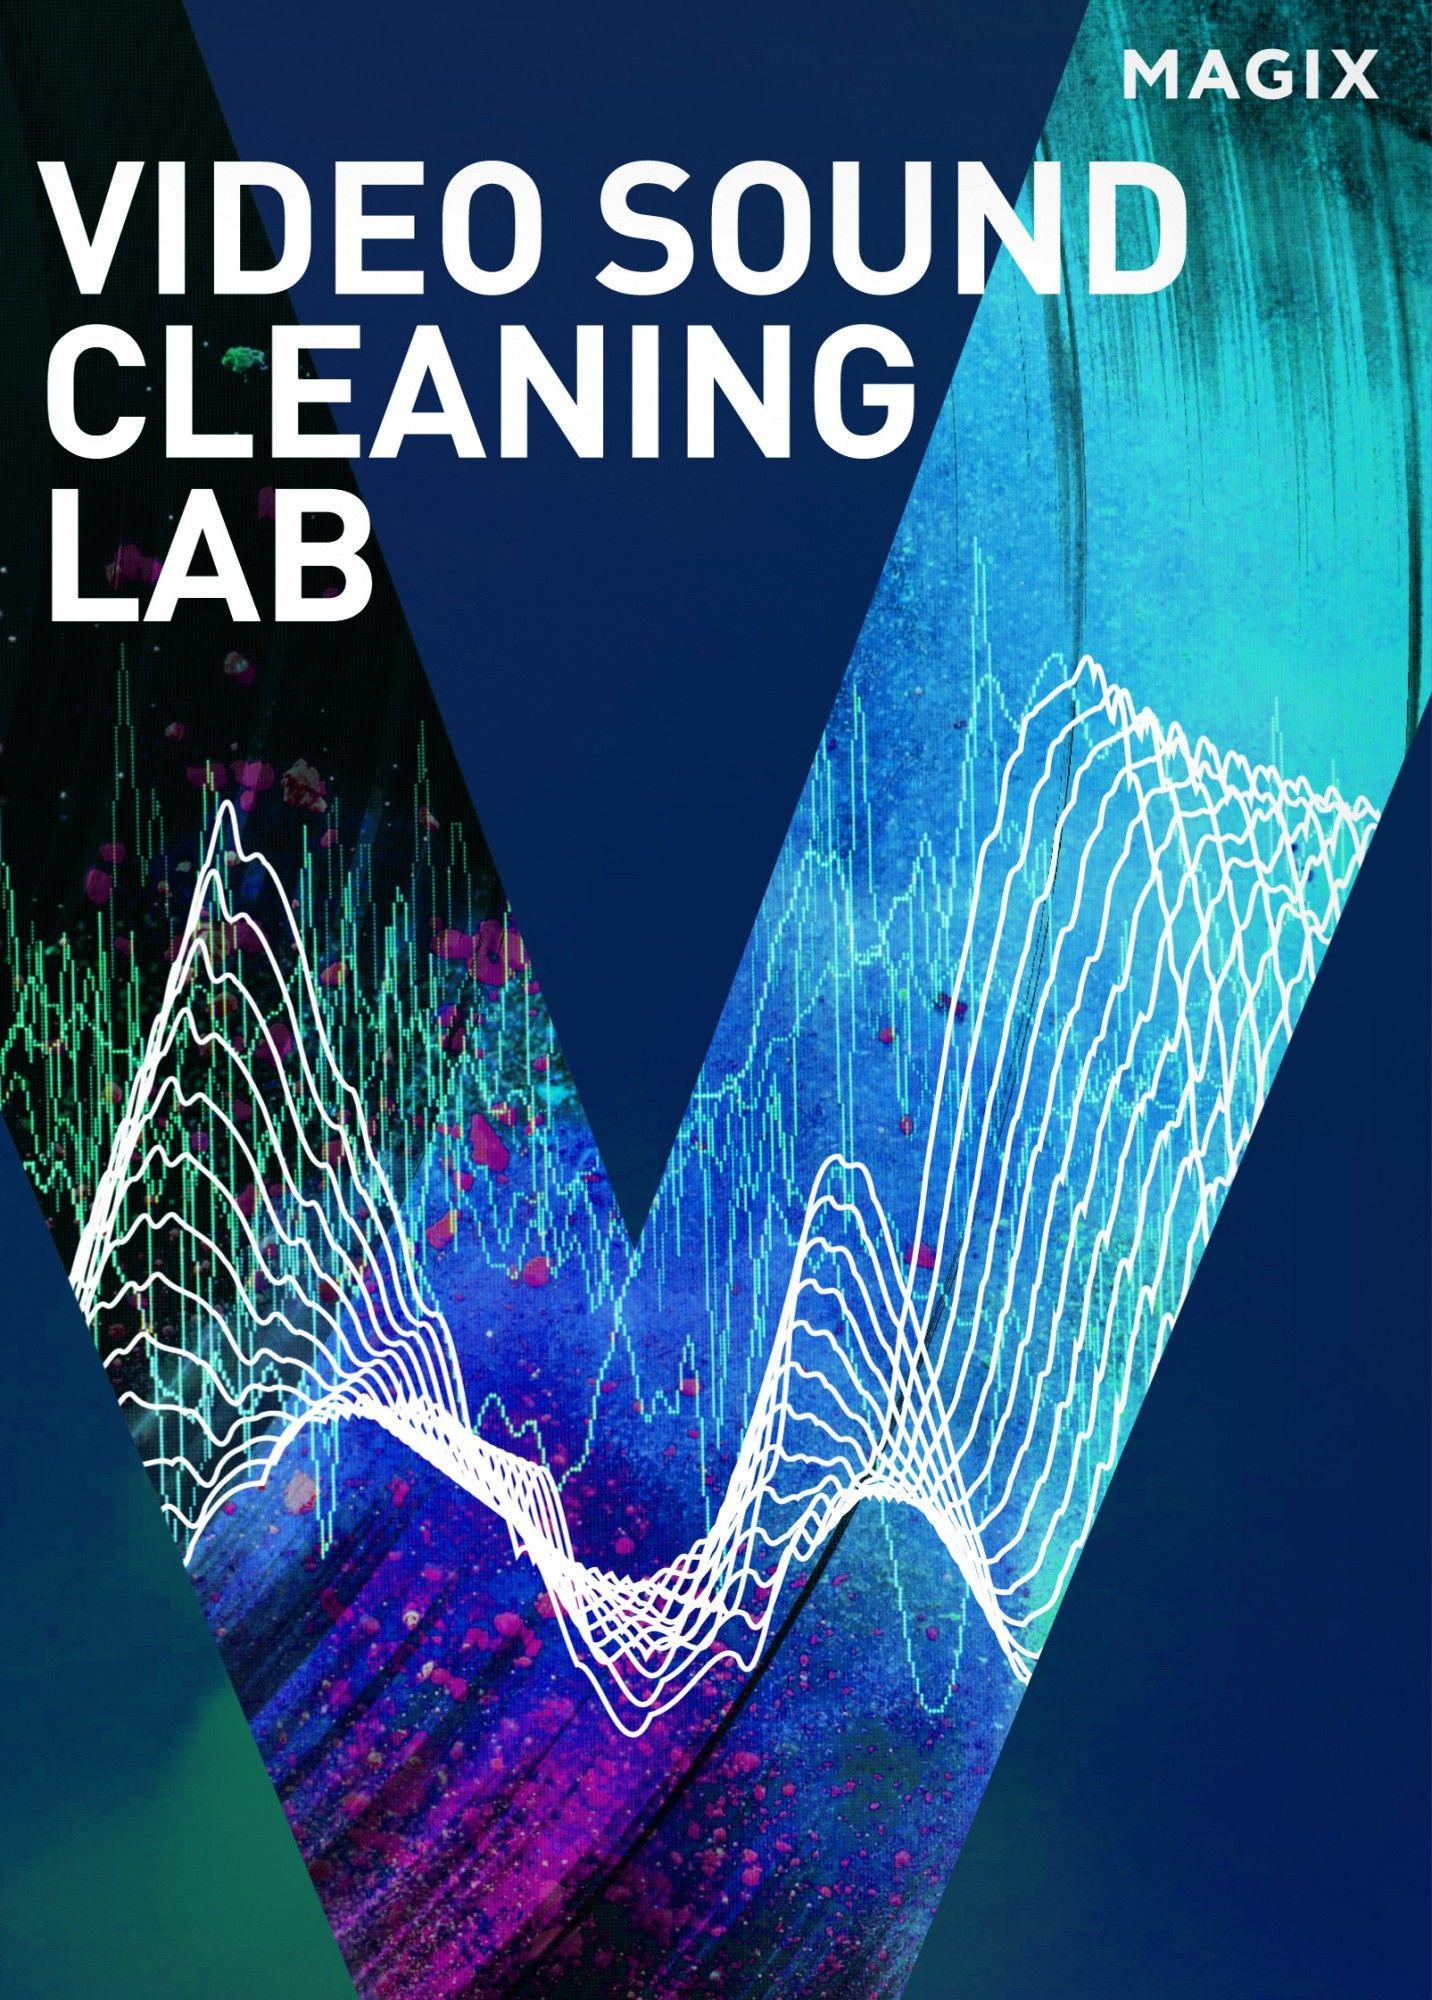 MAGIX Video Sound Cleaning Lab - ESD - cyfrowa - Certyfikaty Rzetelna Firma i Adobe Gold Reseller